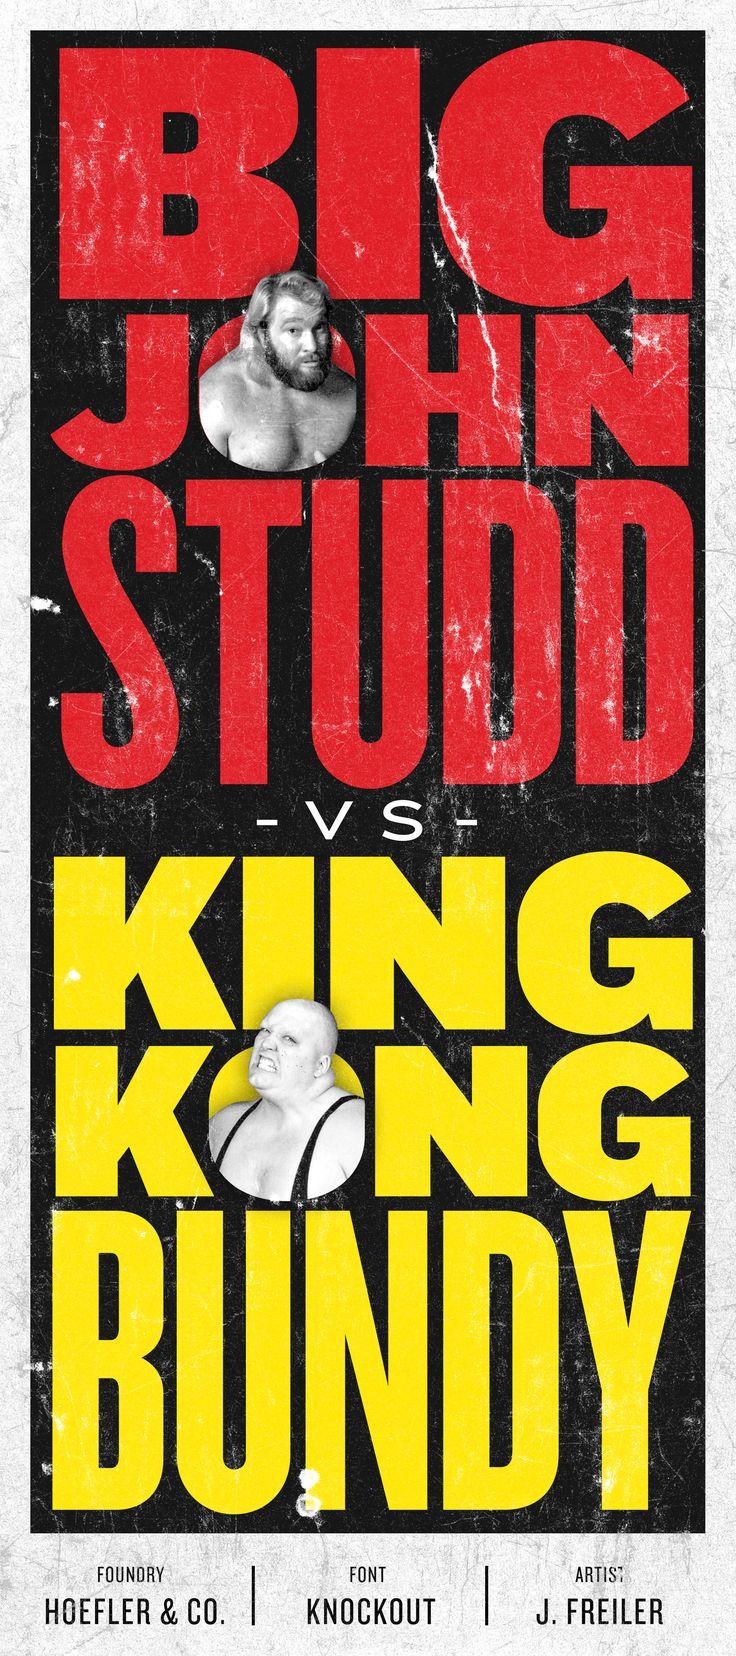 """Big John Studio - VS - King Kong Bundy"" Featuring: Knockout; From: Hoefler & Co; Art by: J. Freiler #fontspiration #fonts #typography #design"